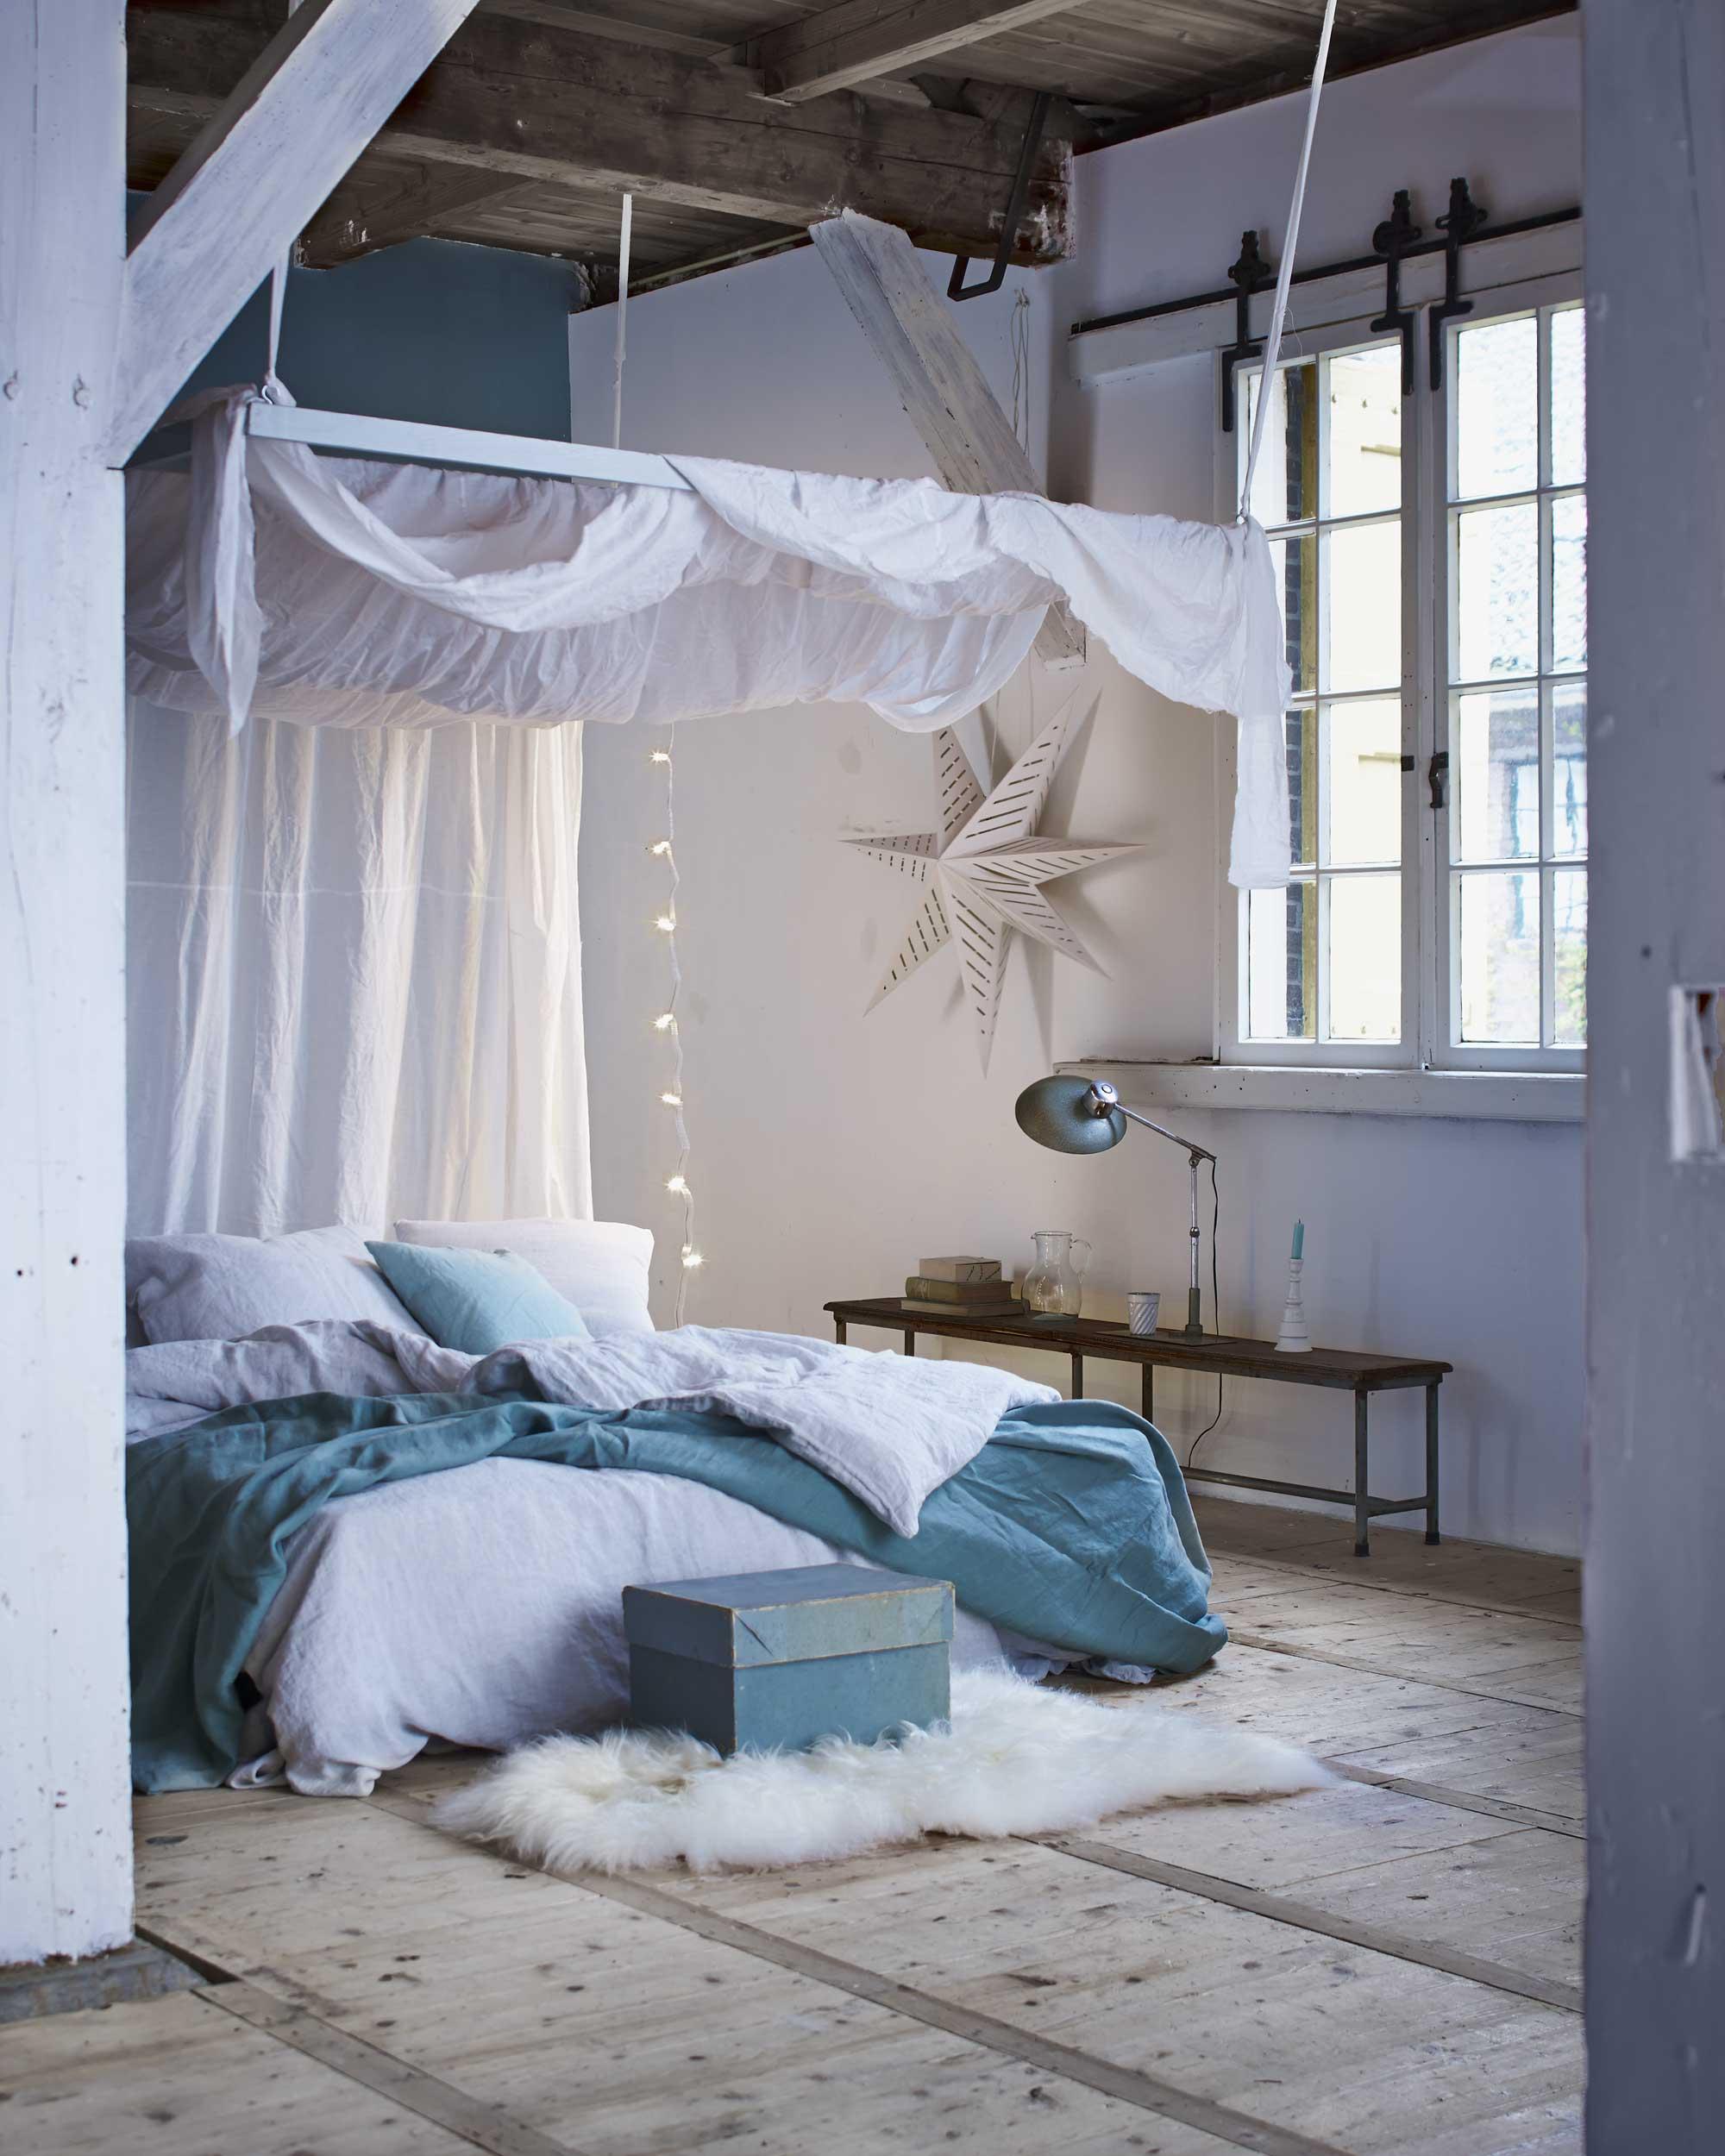 hemelbed-ster-slaapkamer